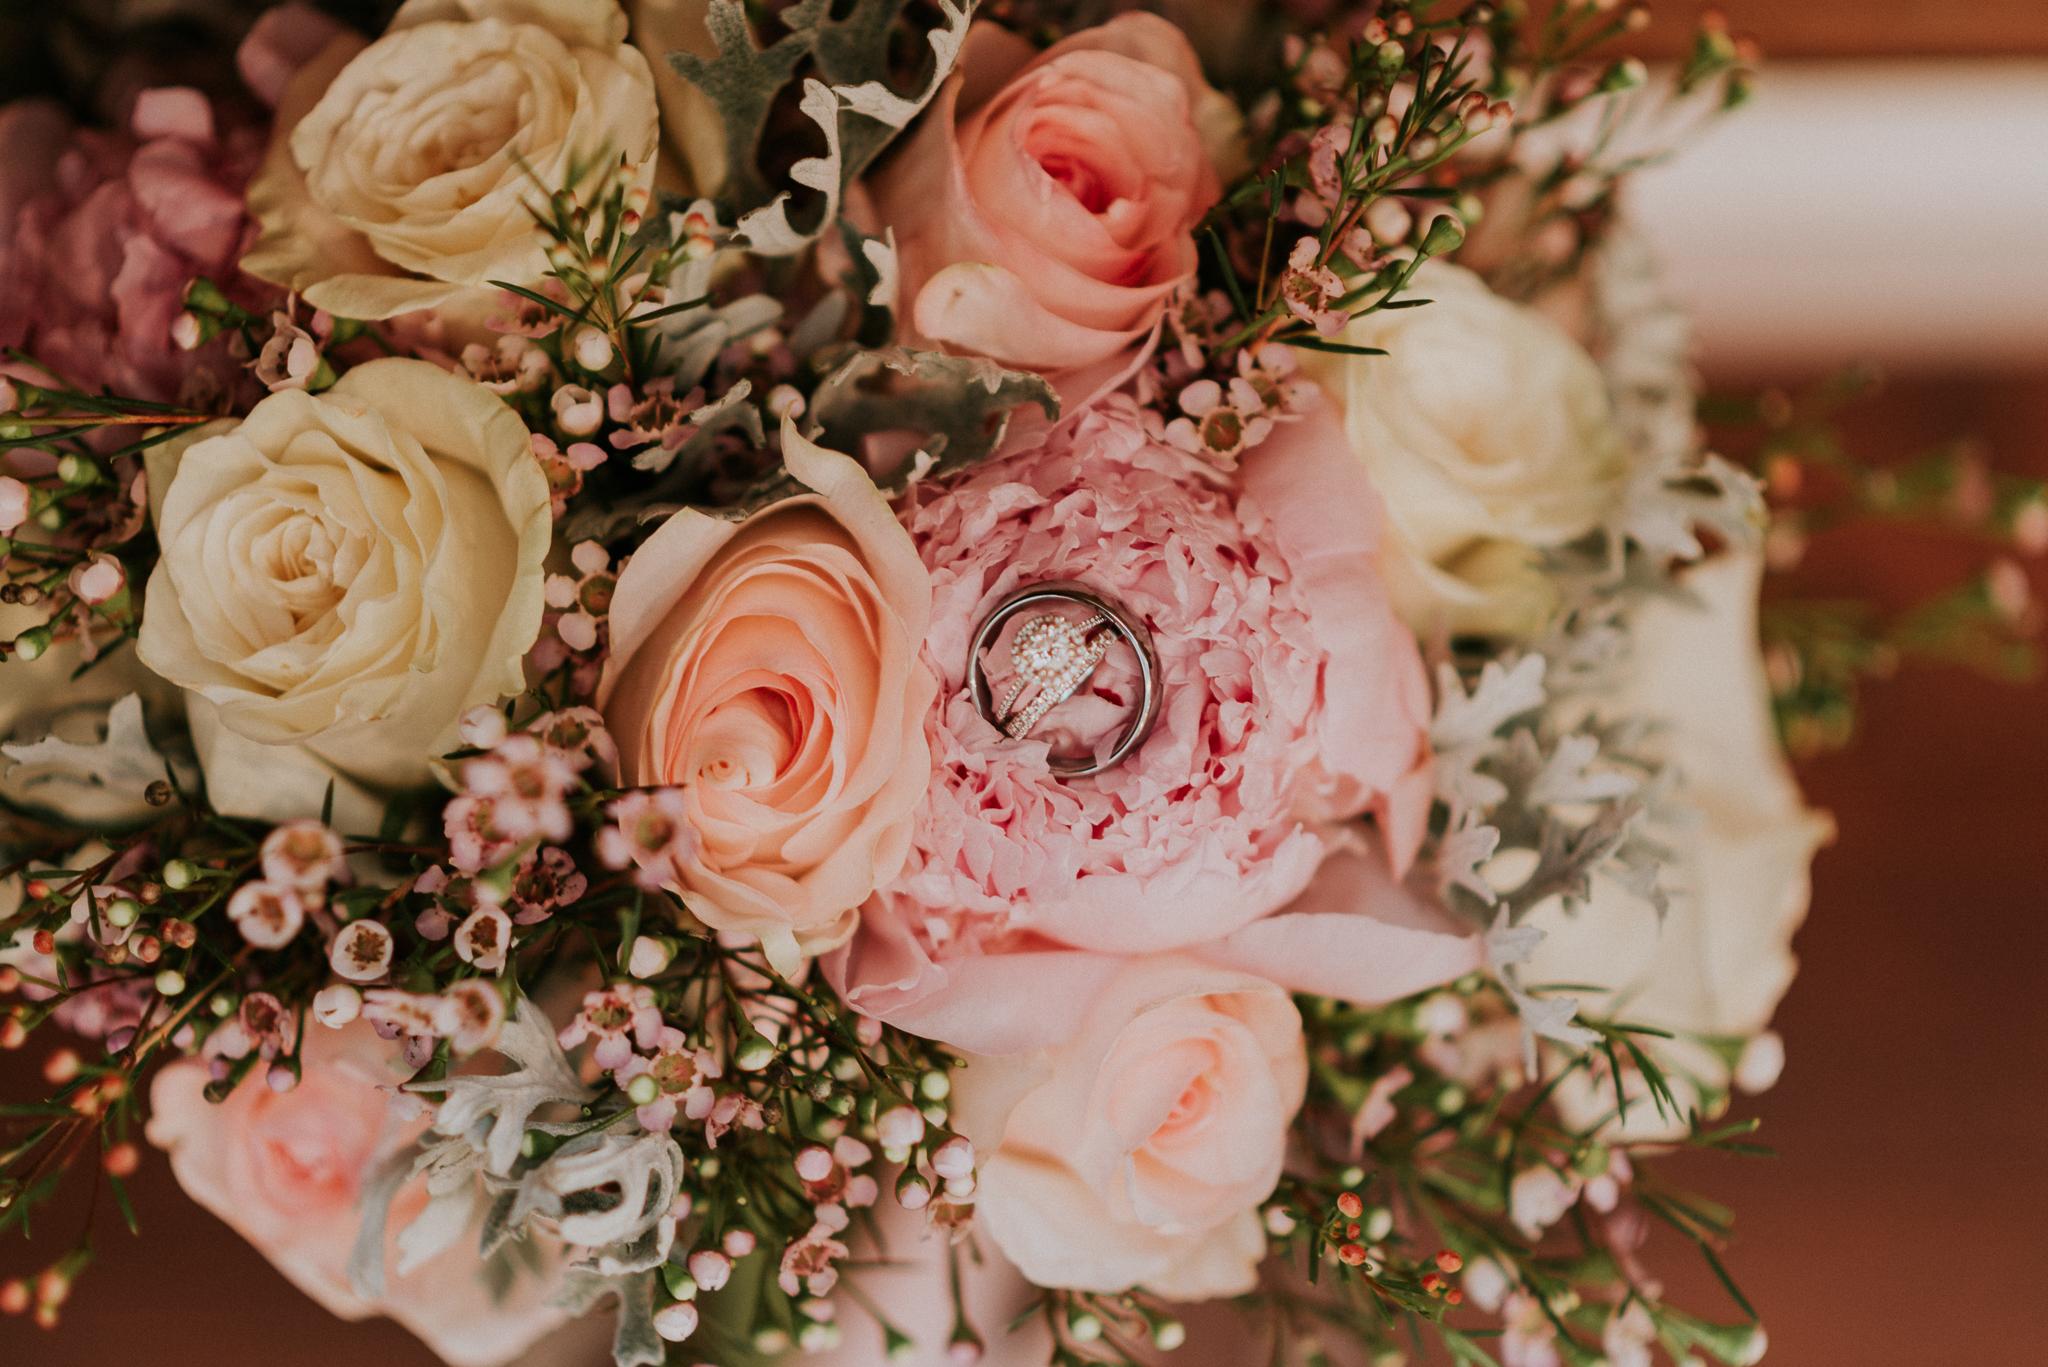 east-tn-wedding-photographer-tennessee-elopement-photographer-kingsport-tn-wedding-photographer (18 of 50).jpg